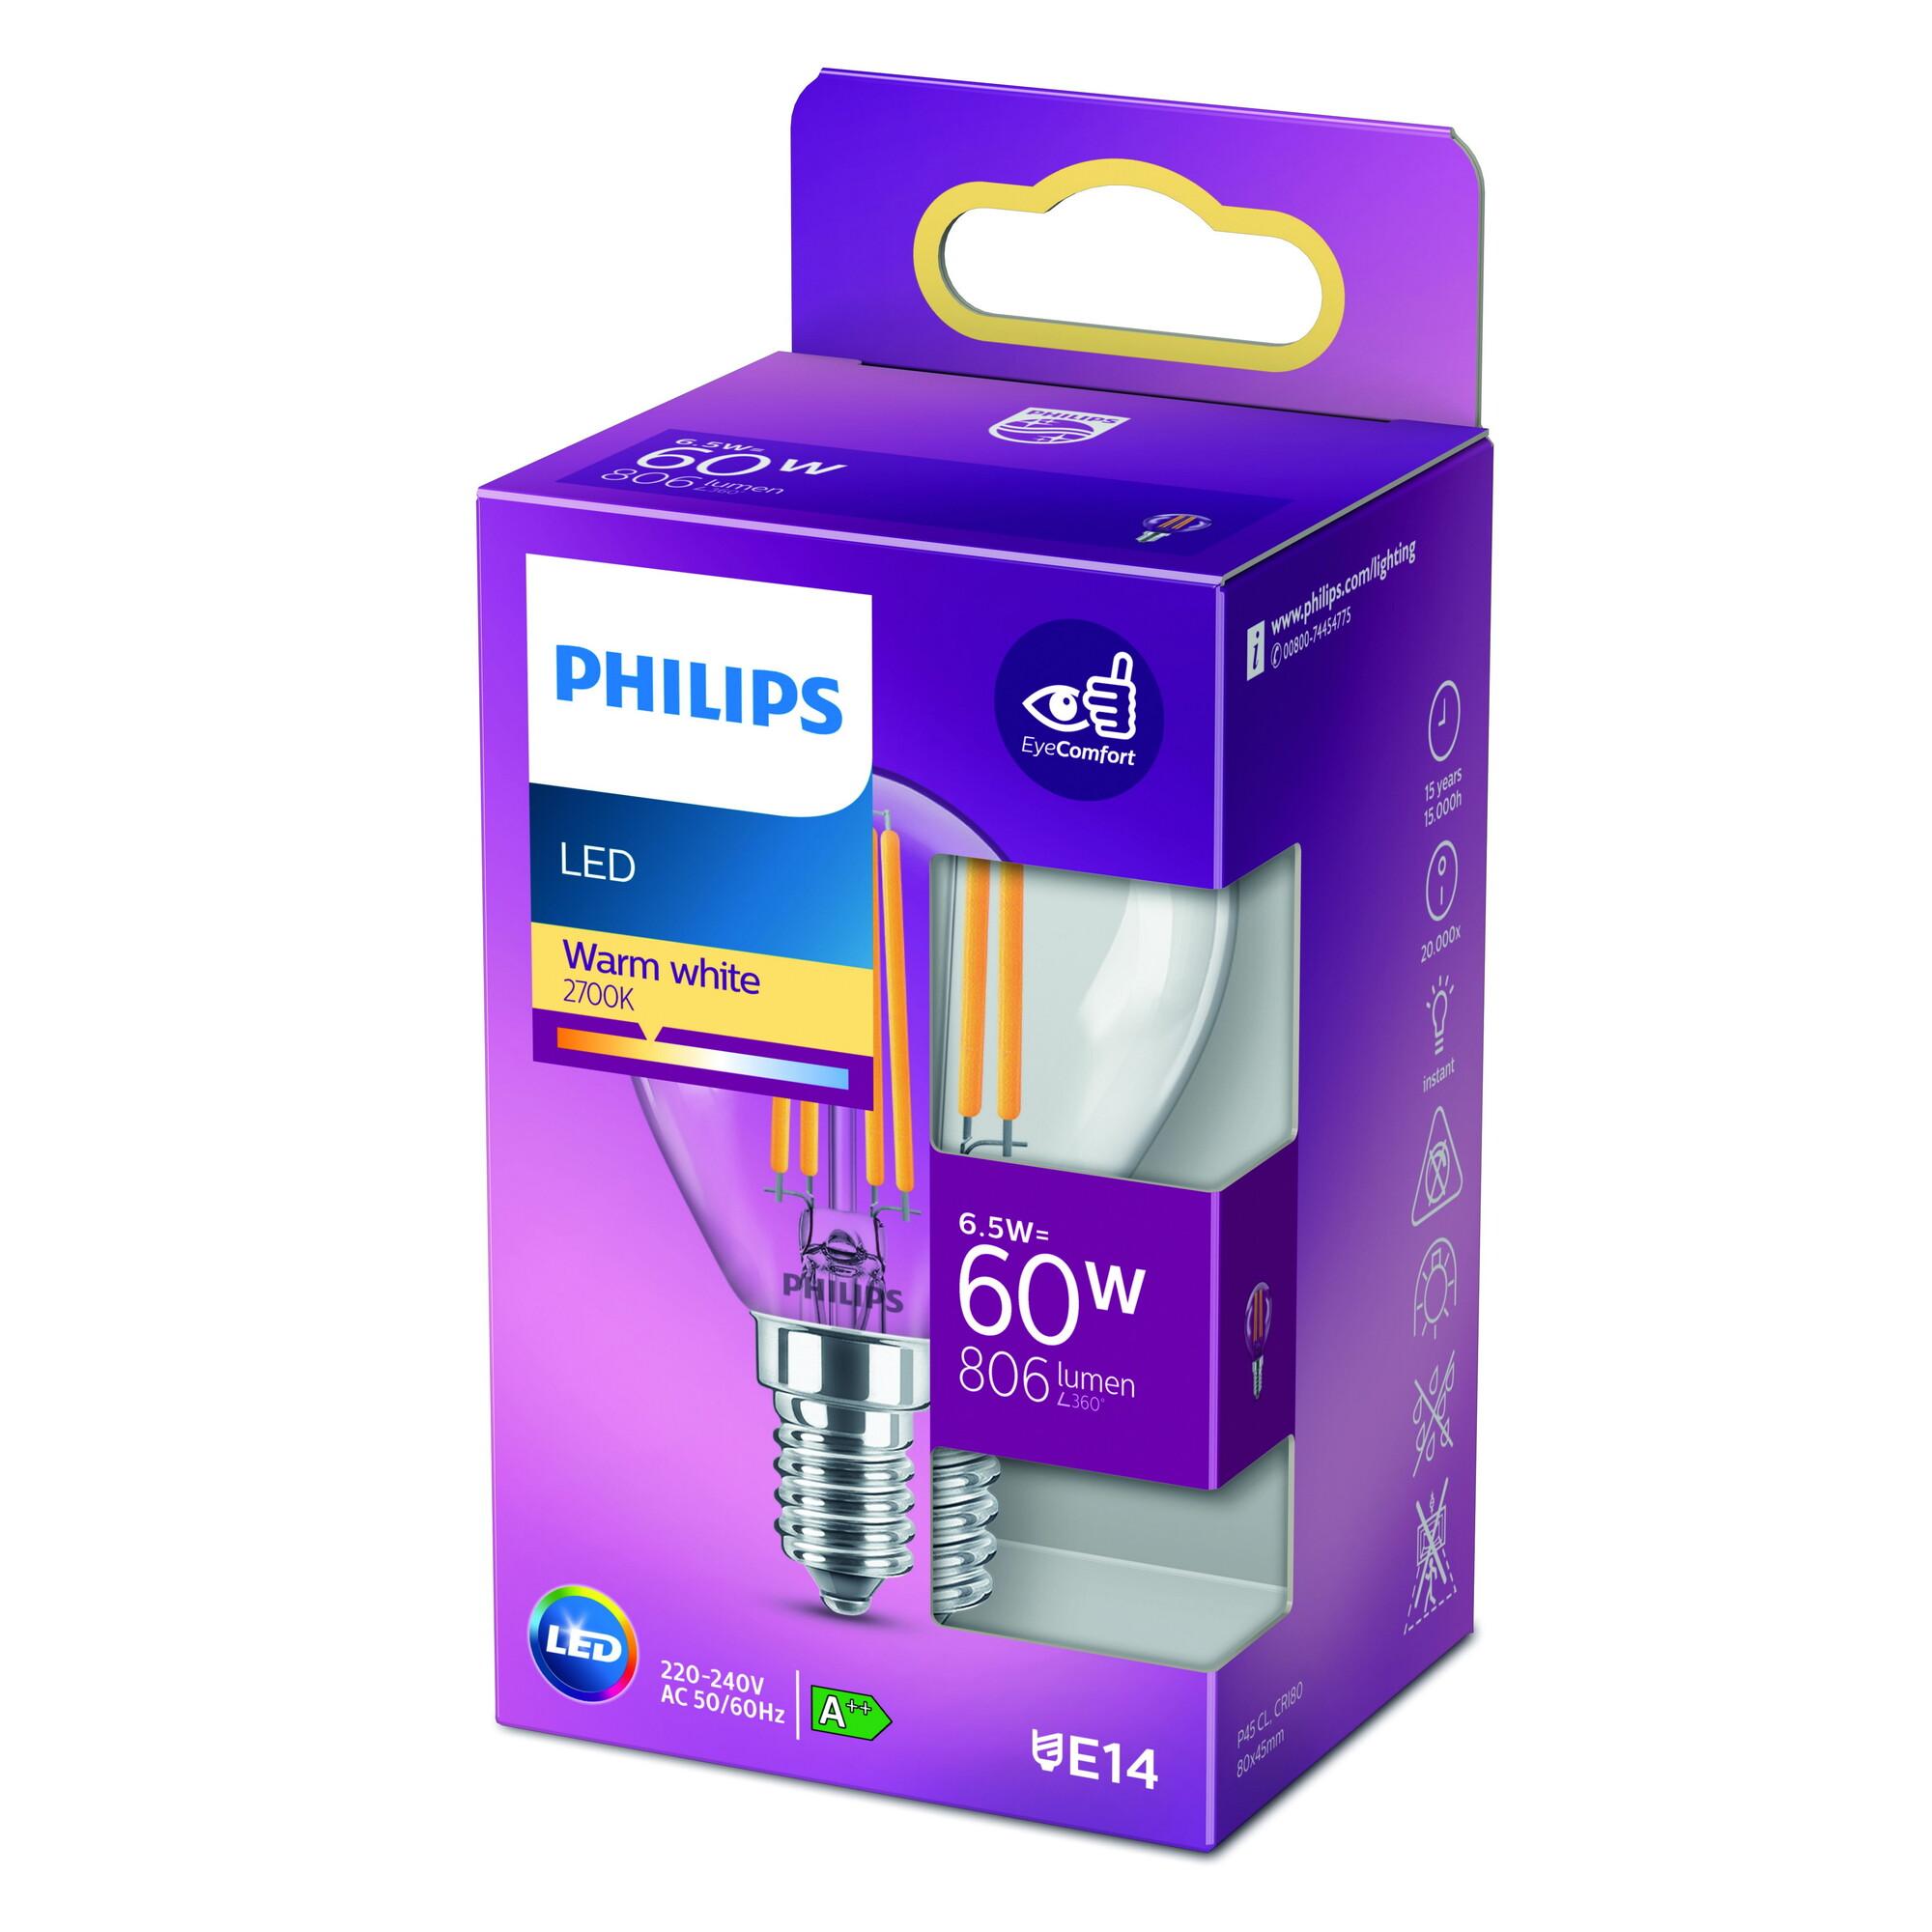 Philips LED classic E14 6,5W 806lm 2700K Kogel Transparant